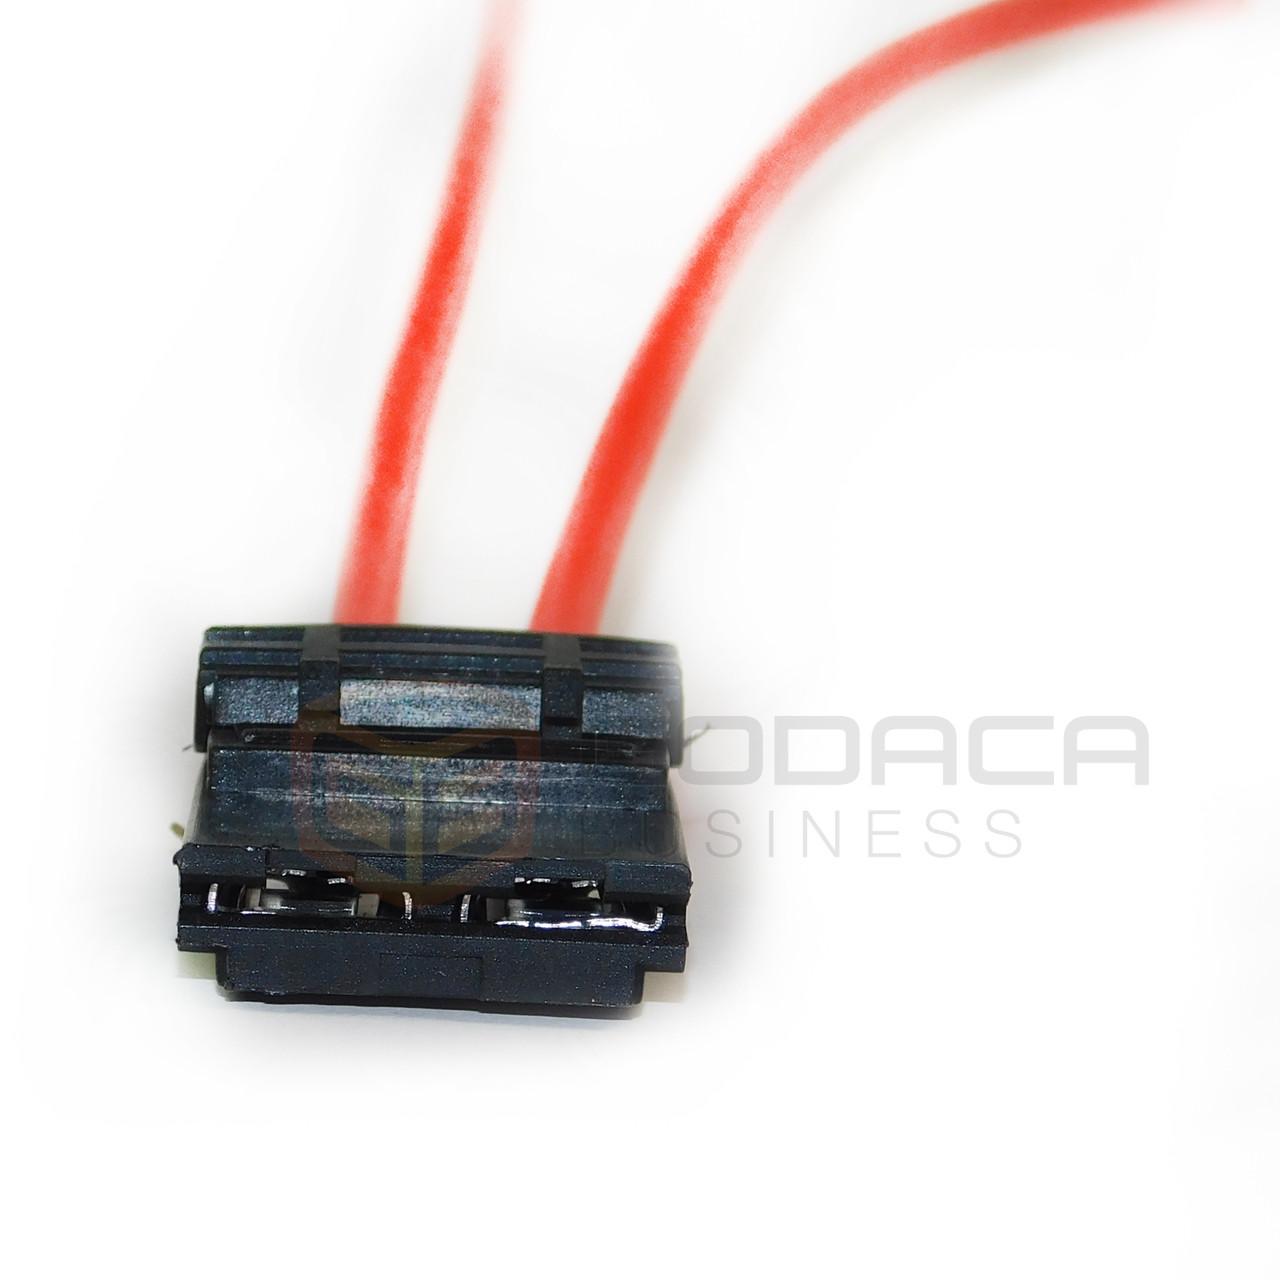 connector 2 way socket distributor wiring harness adapter style a godaca llc  [ 1280 x 1280 Pixel ]